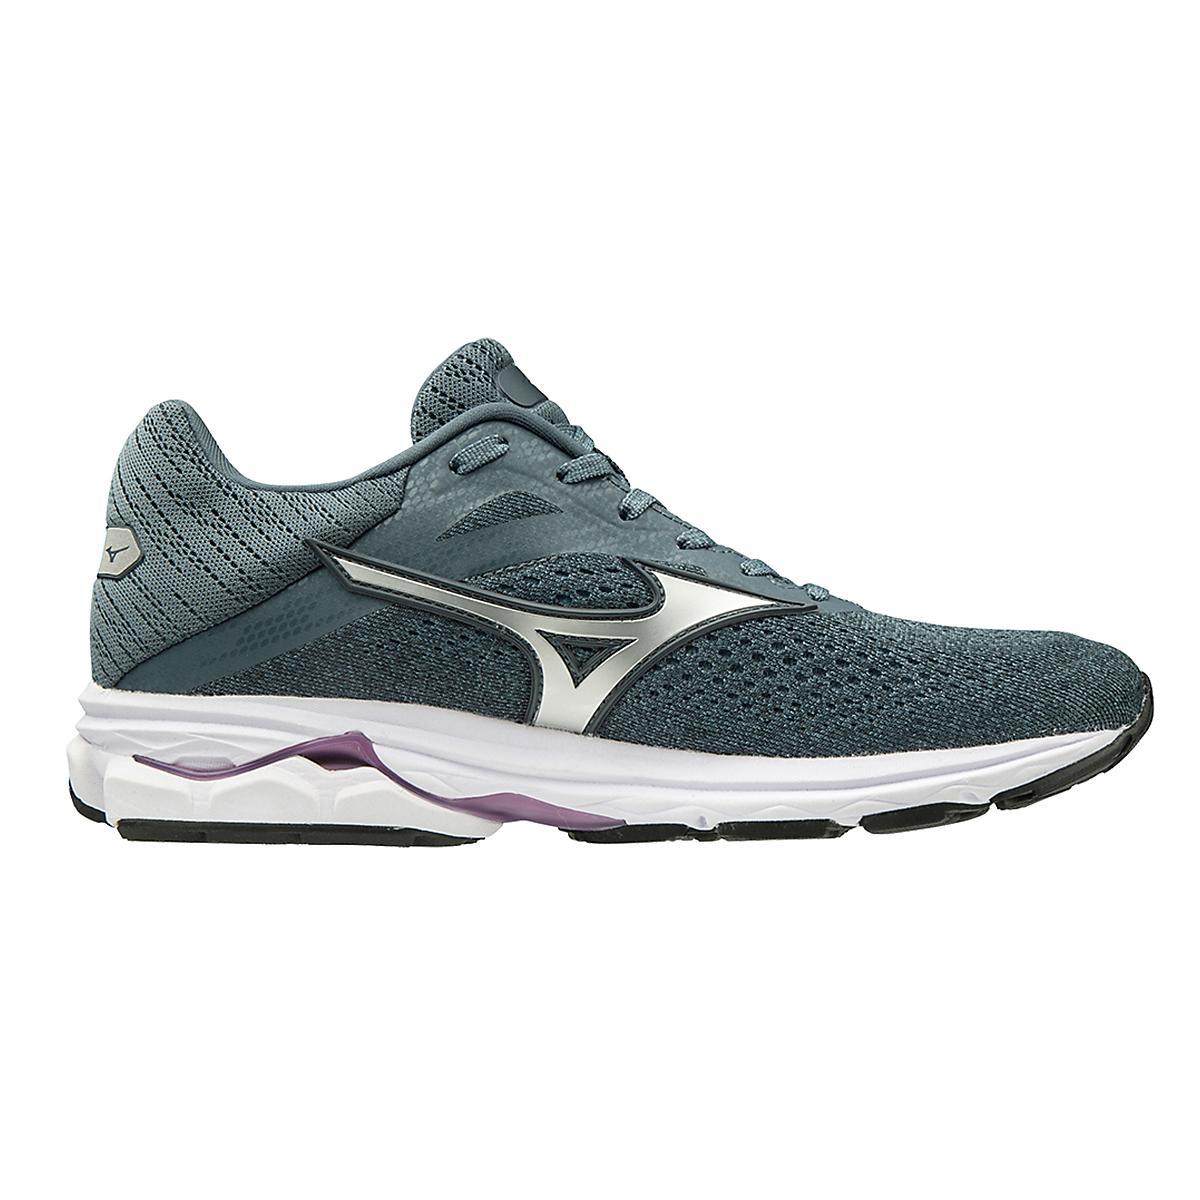 mizuno womens volleyball shoes size 8 x 3 free walking